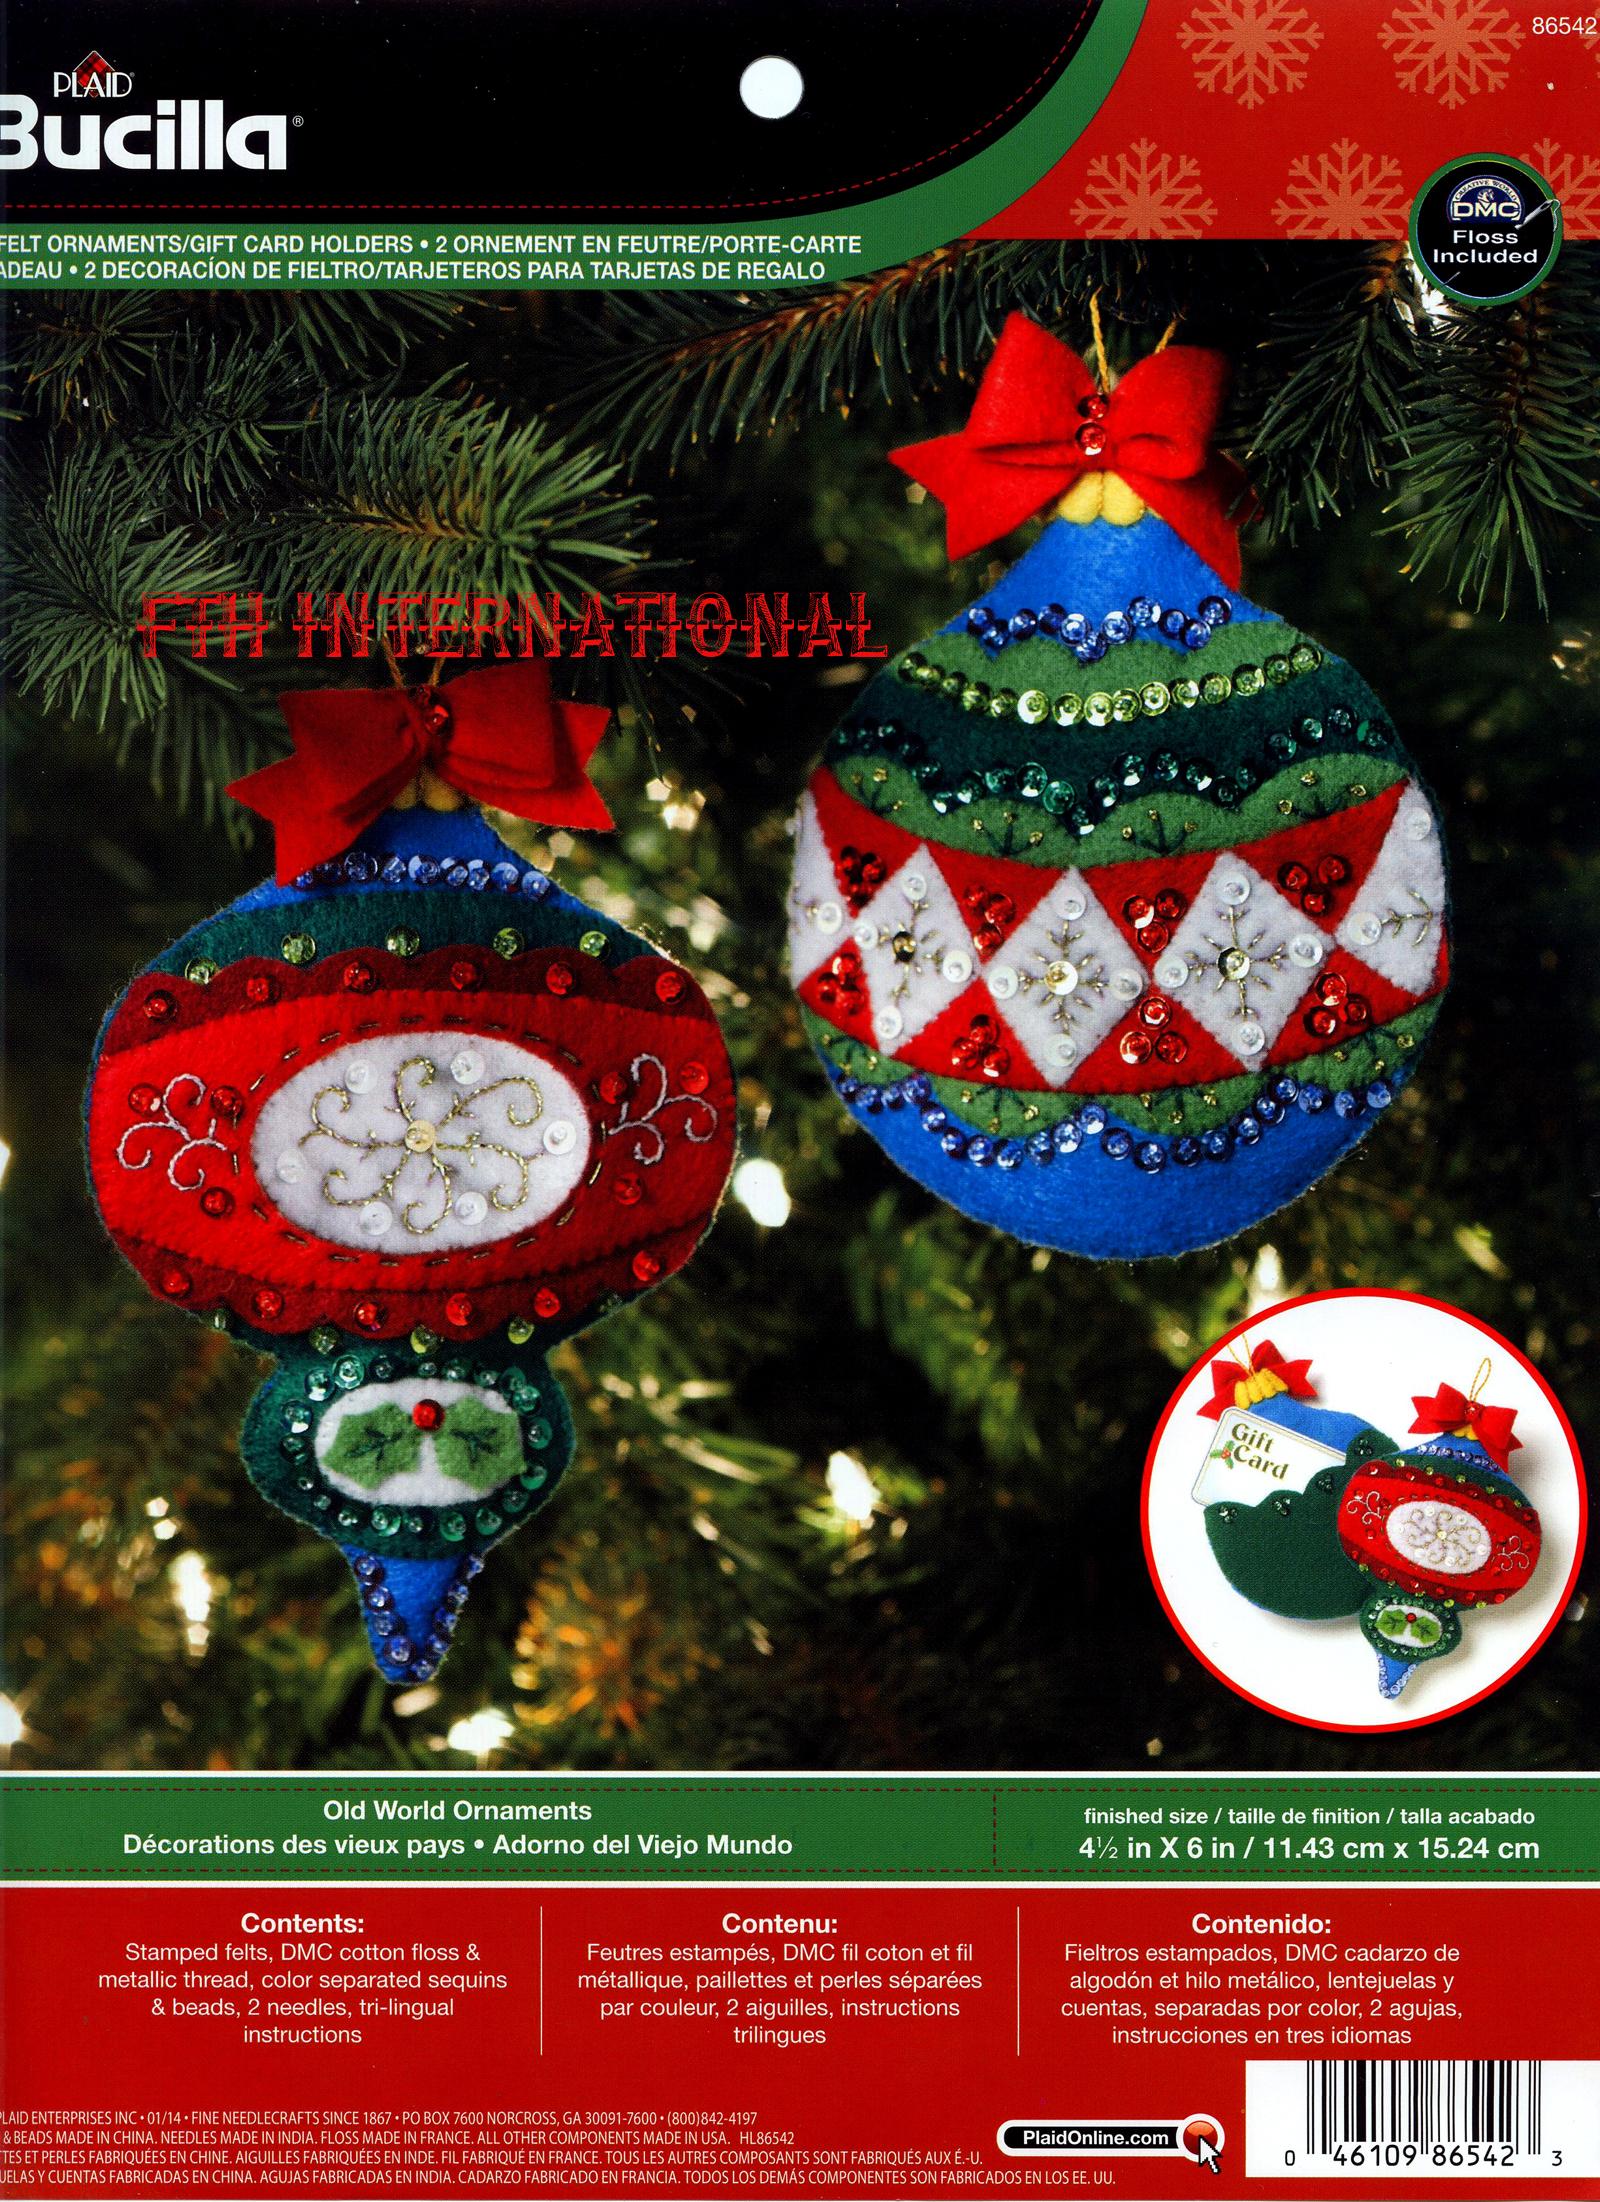 Old World Ornament Gift Card Holders 2 pce Bucilla Felt Christmas ...